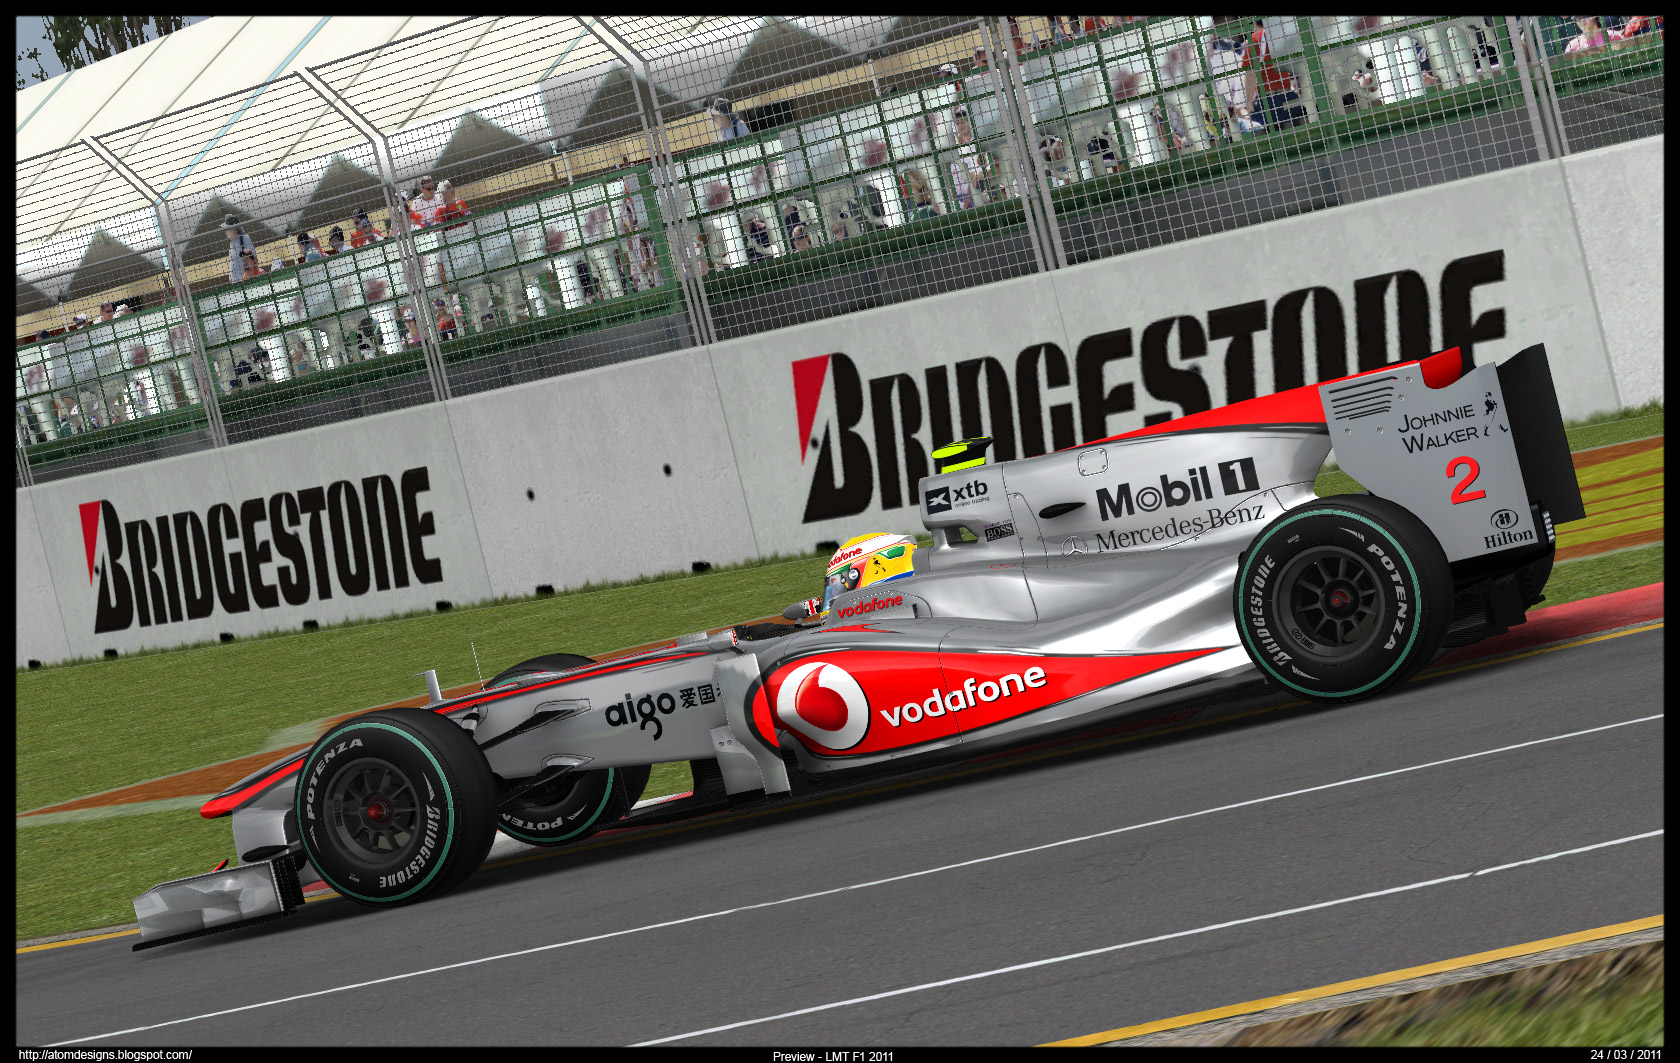 [rFactor] Mod F1 LMT 2010 02mclaren17hv